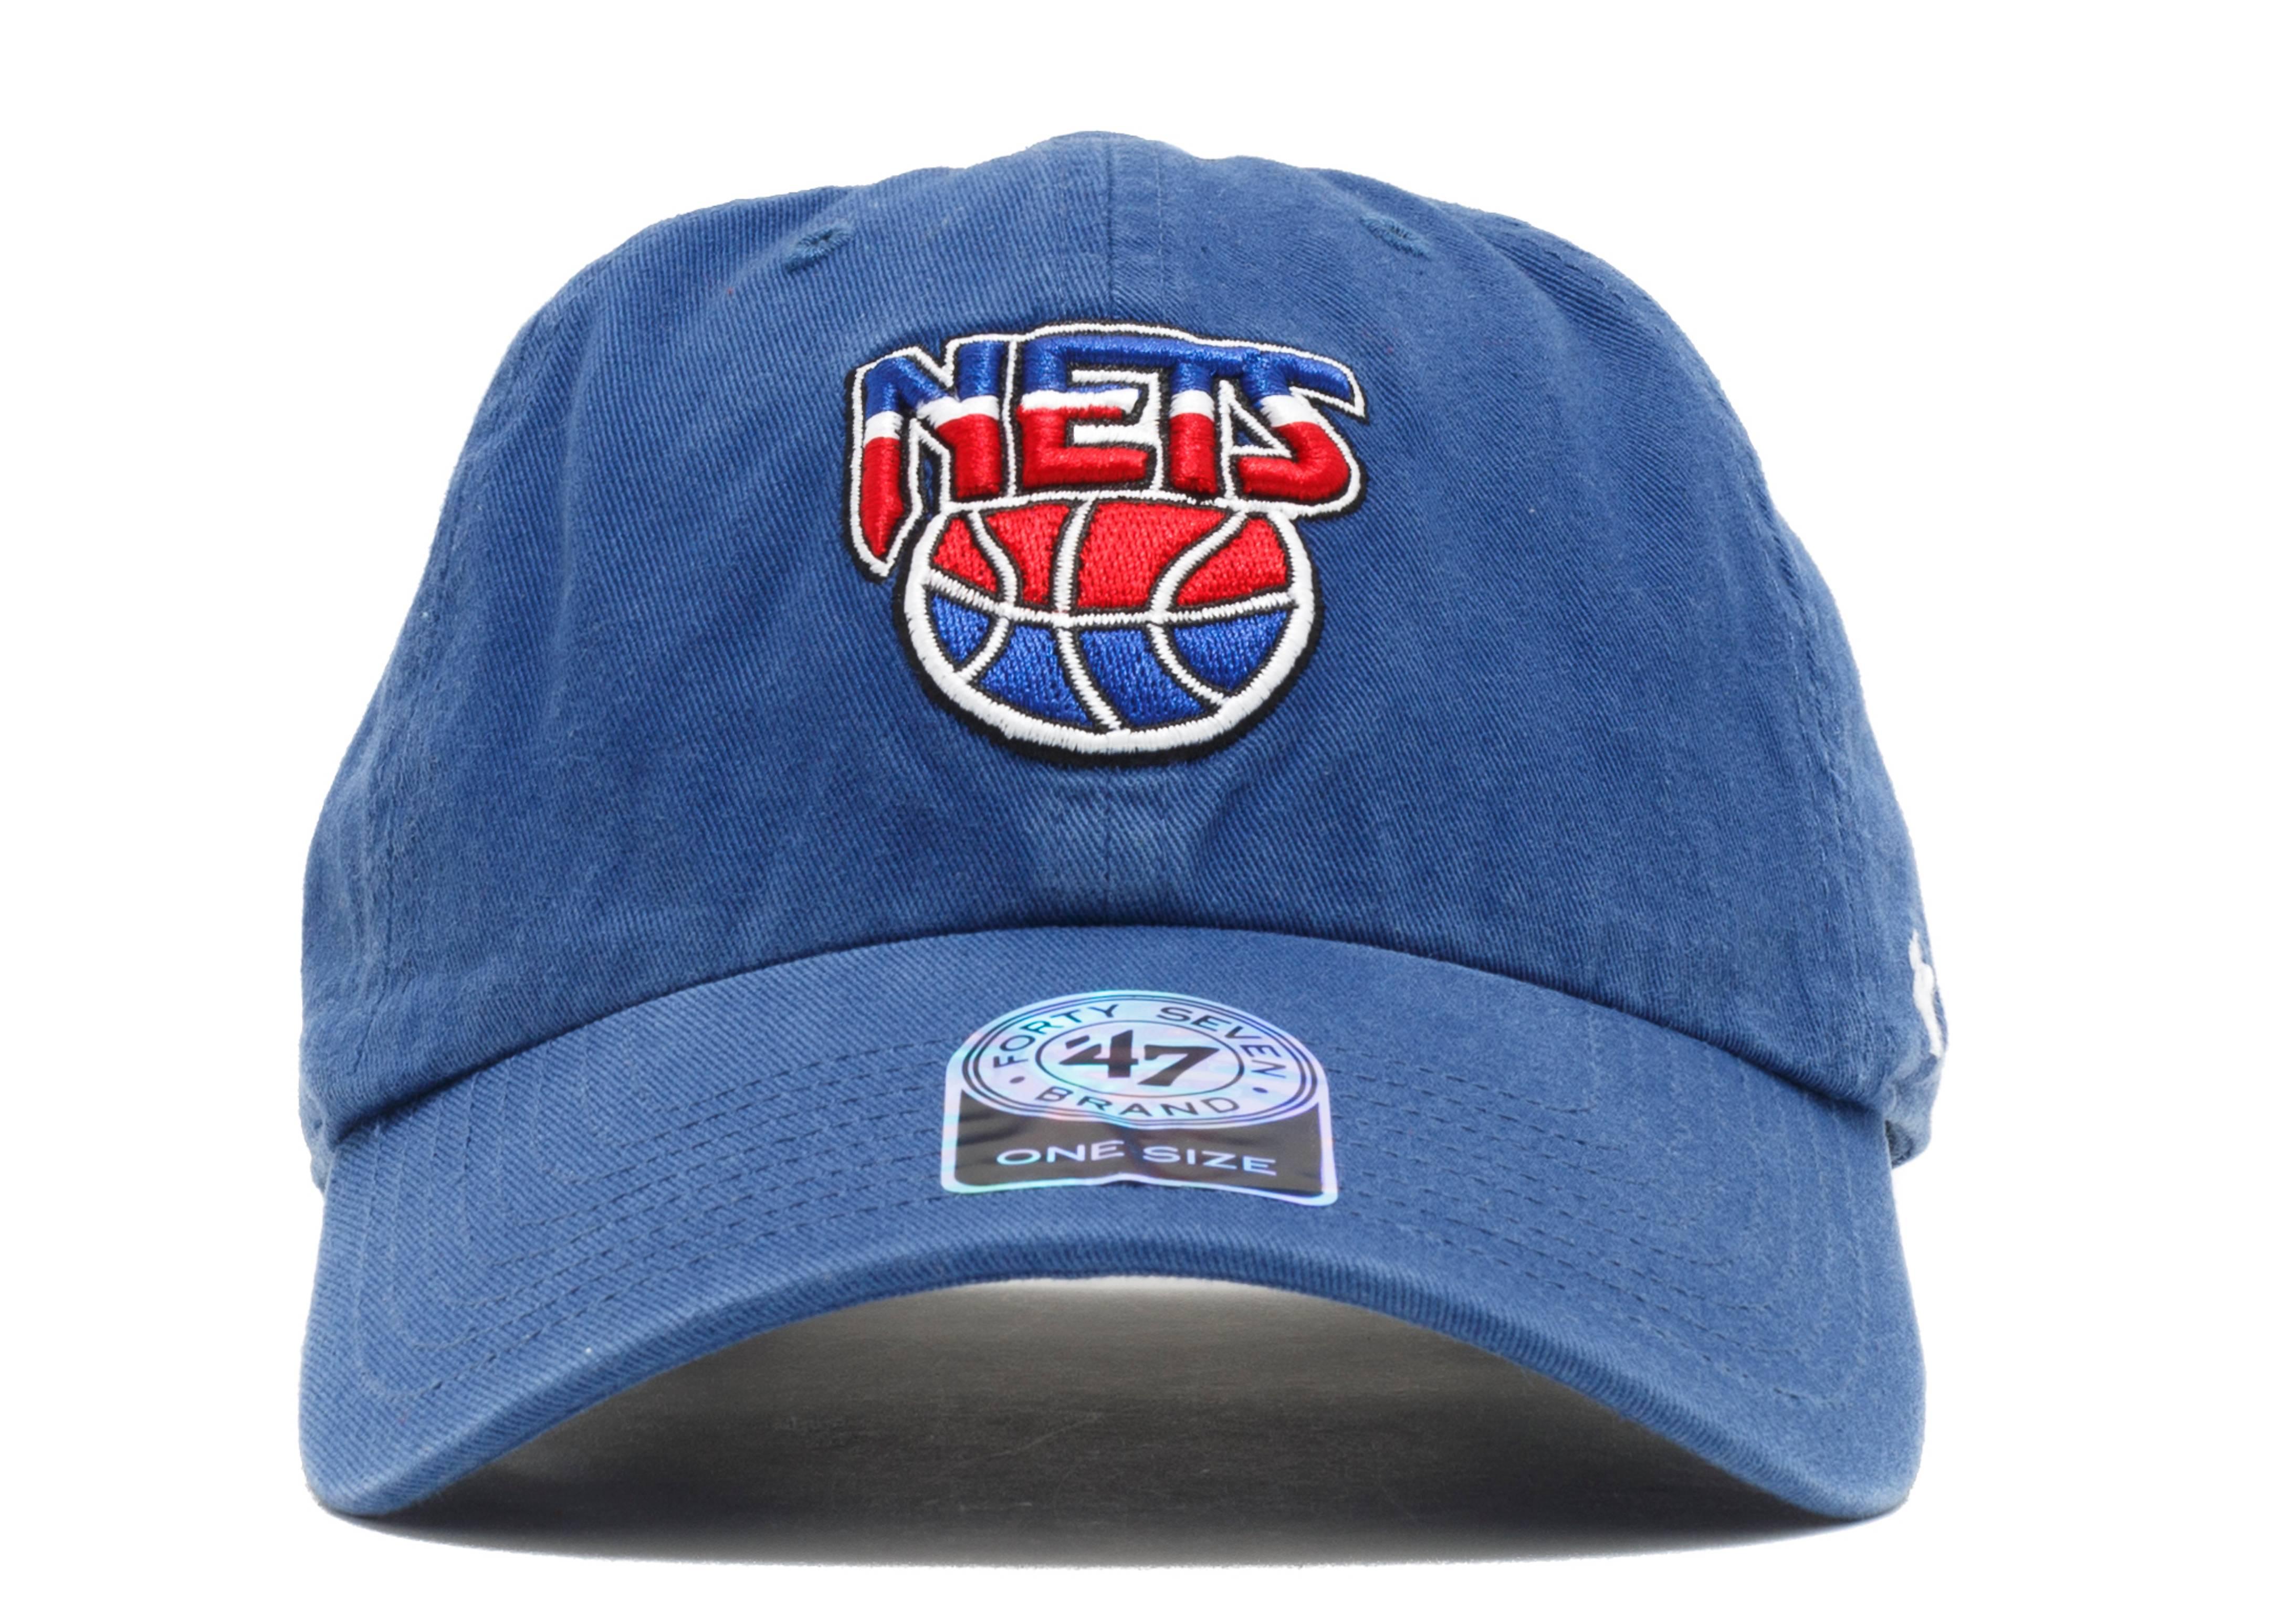 New Jersey Nets Strap-back - 47 Brand - khwclrgw15gwsry90 - royal ... bffd70569ac3